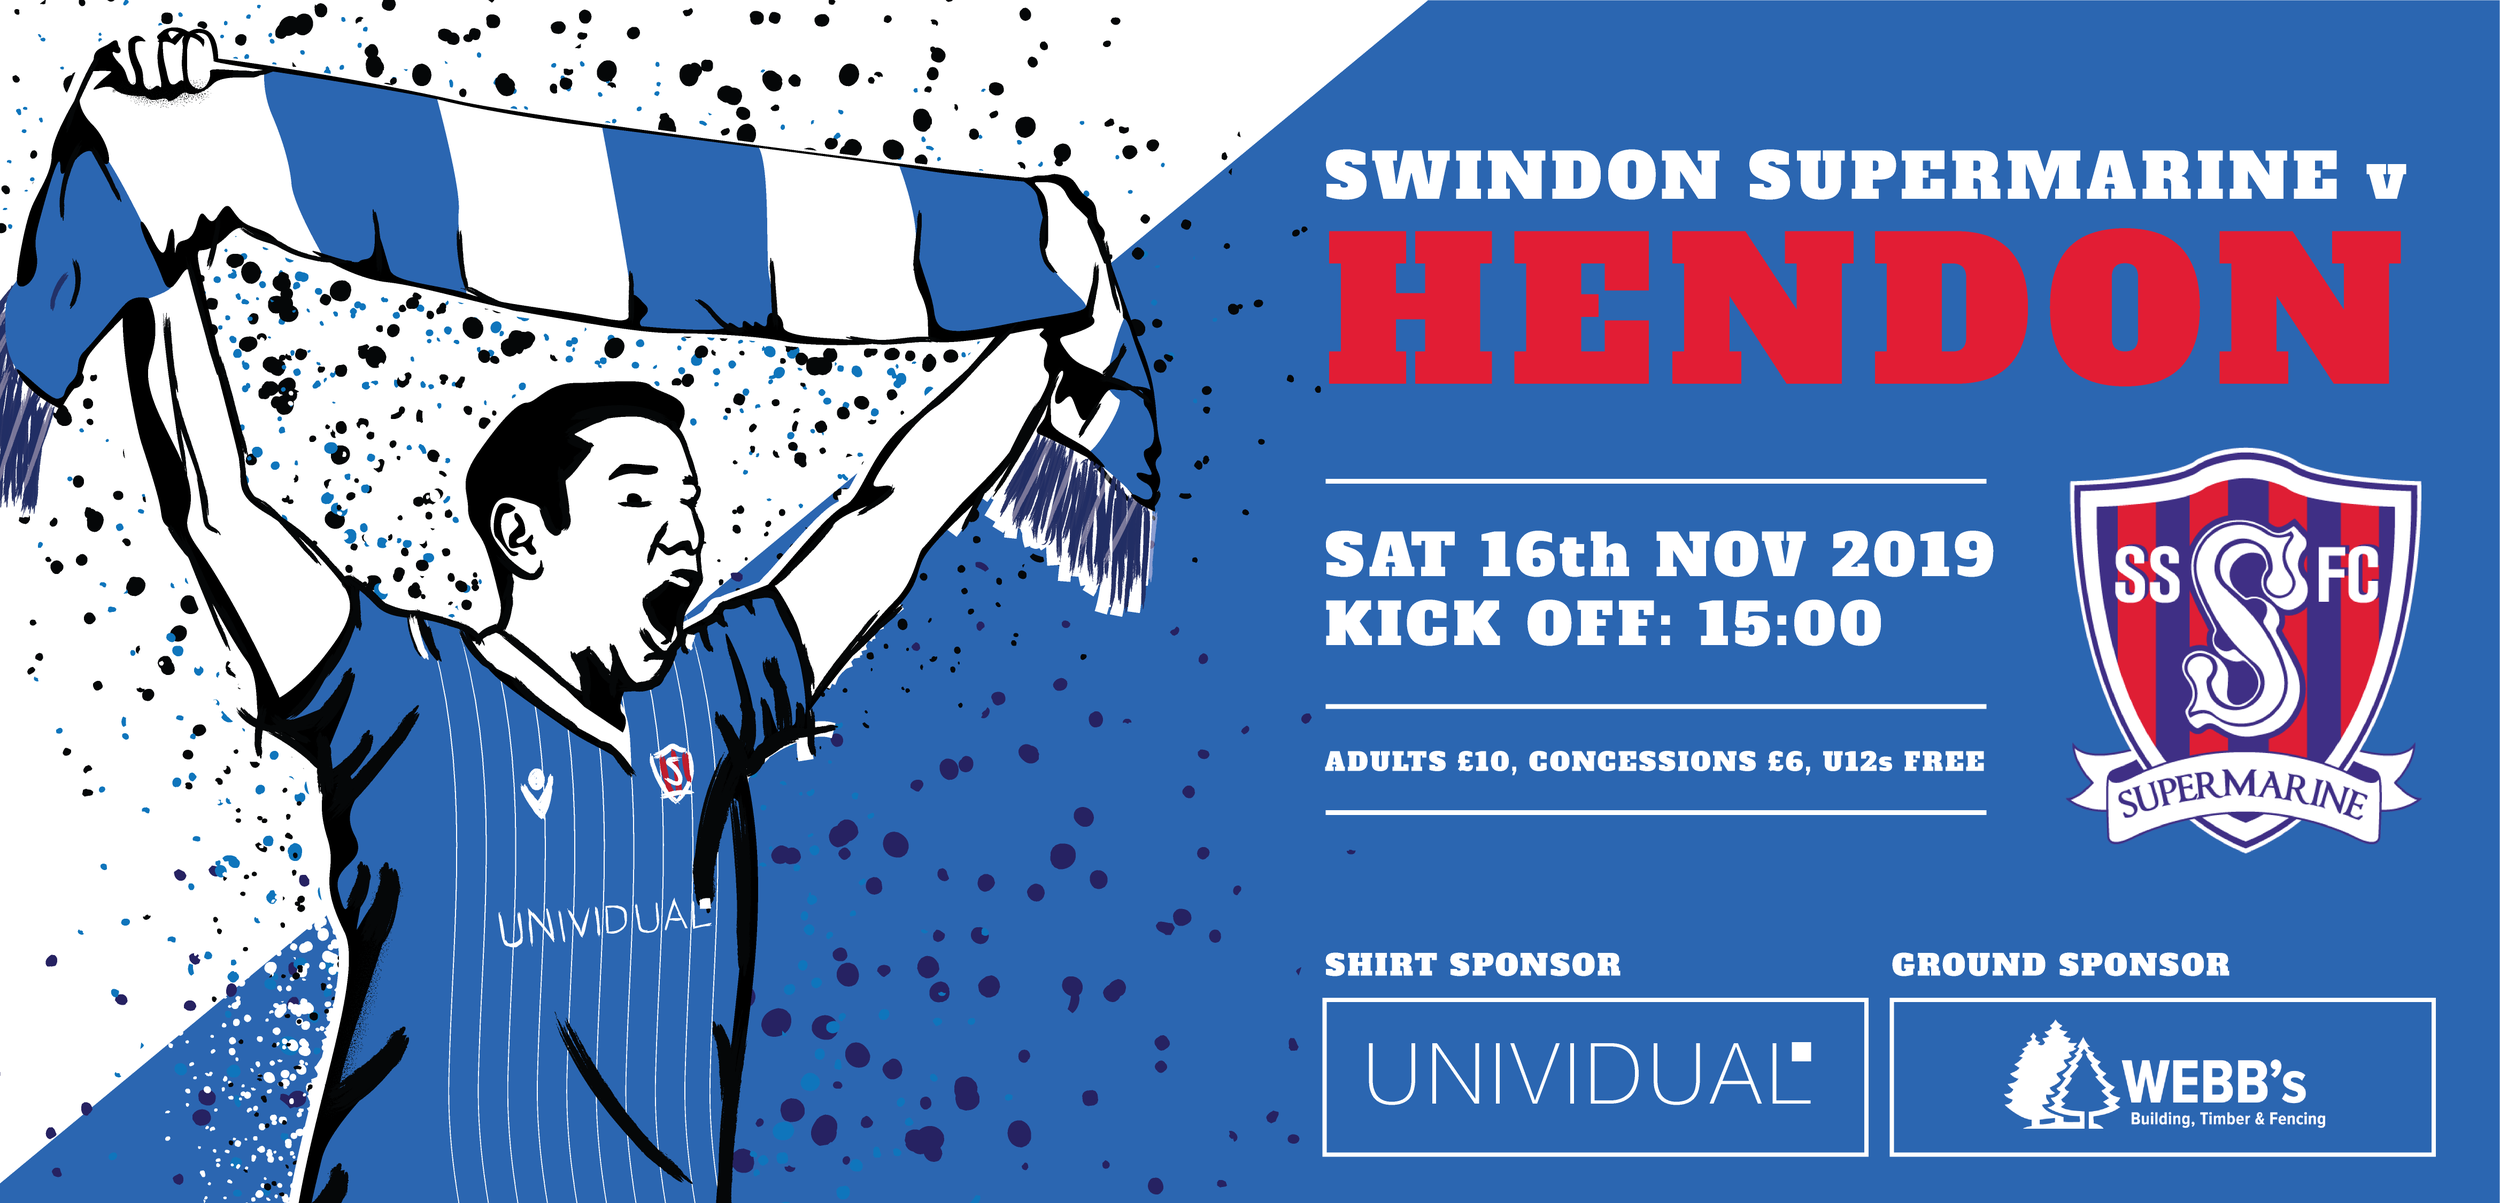 06 Swindon Fixture v Hendon-01.png